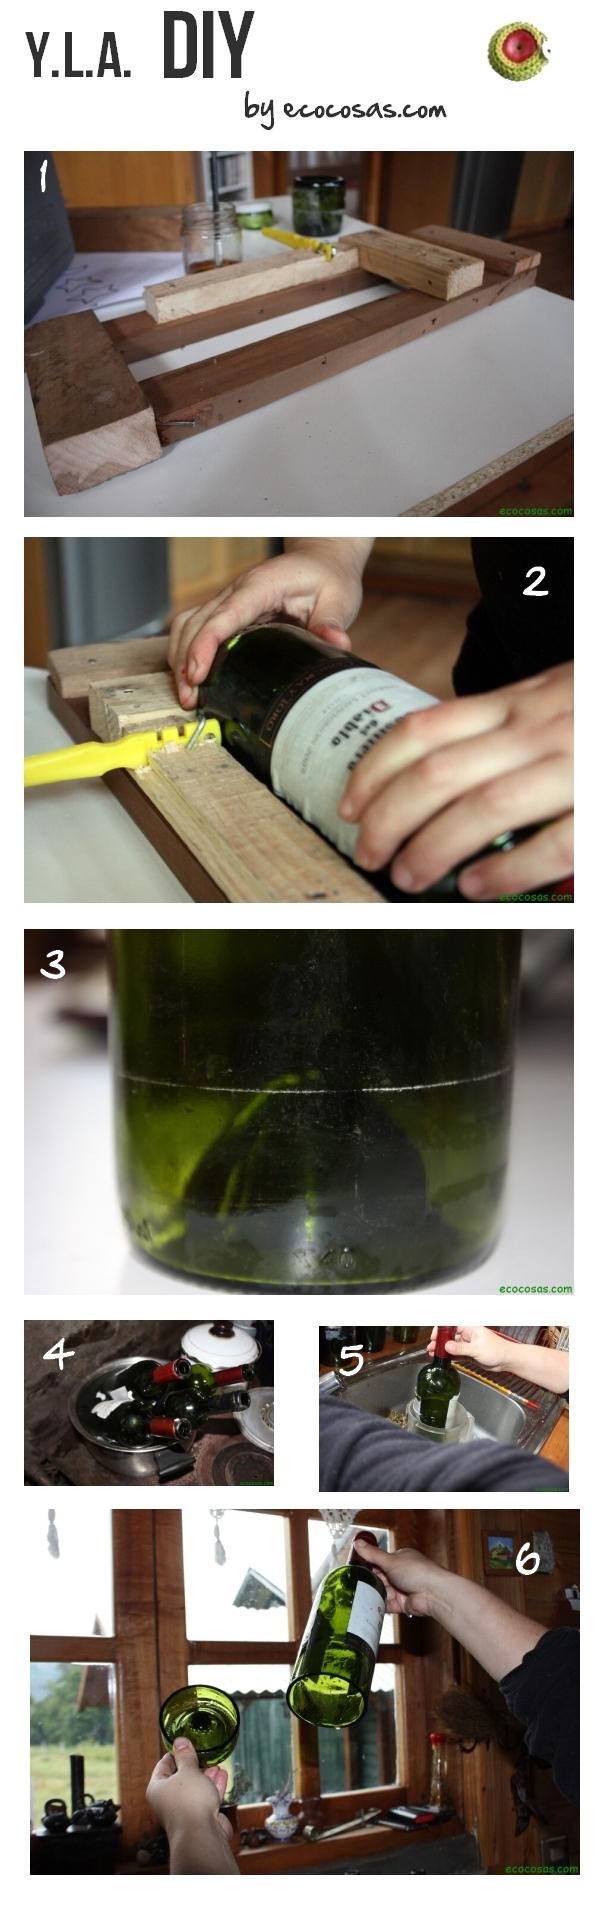 corta-botellas